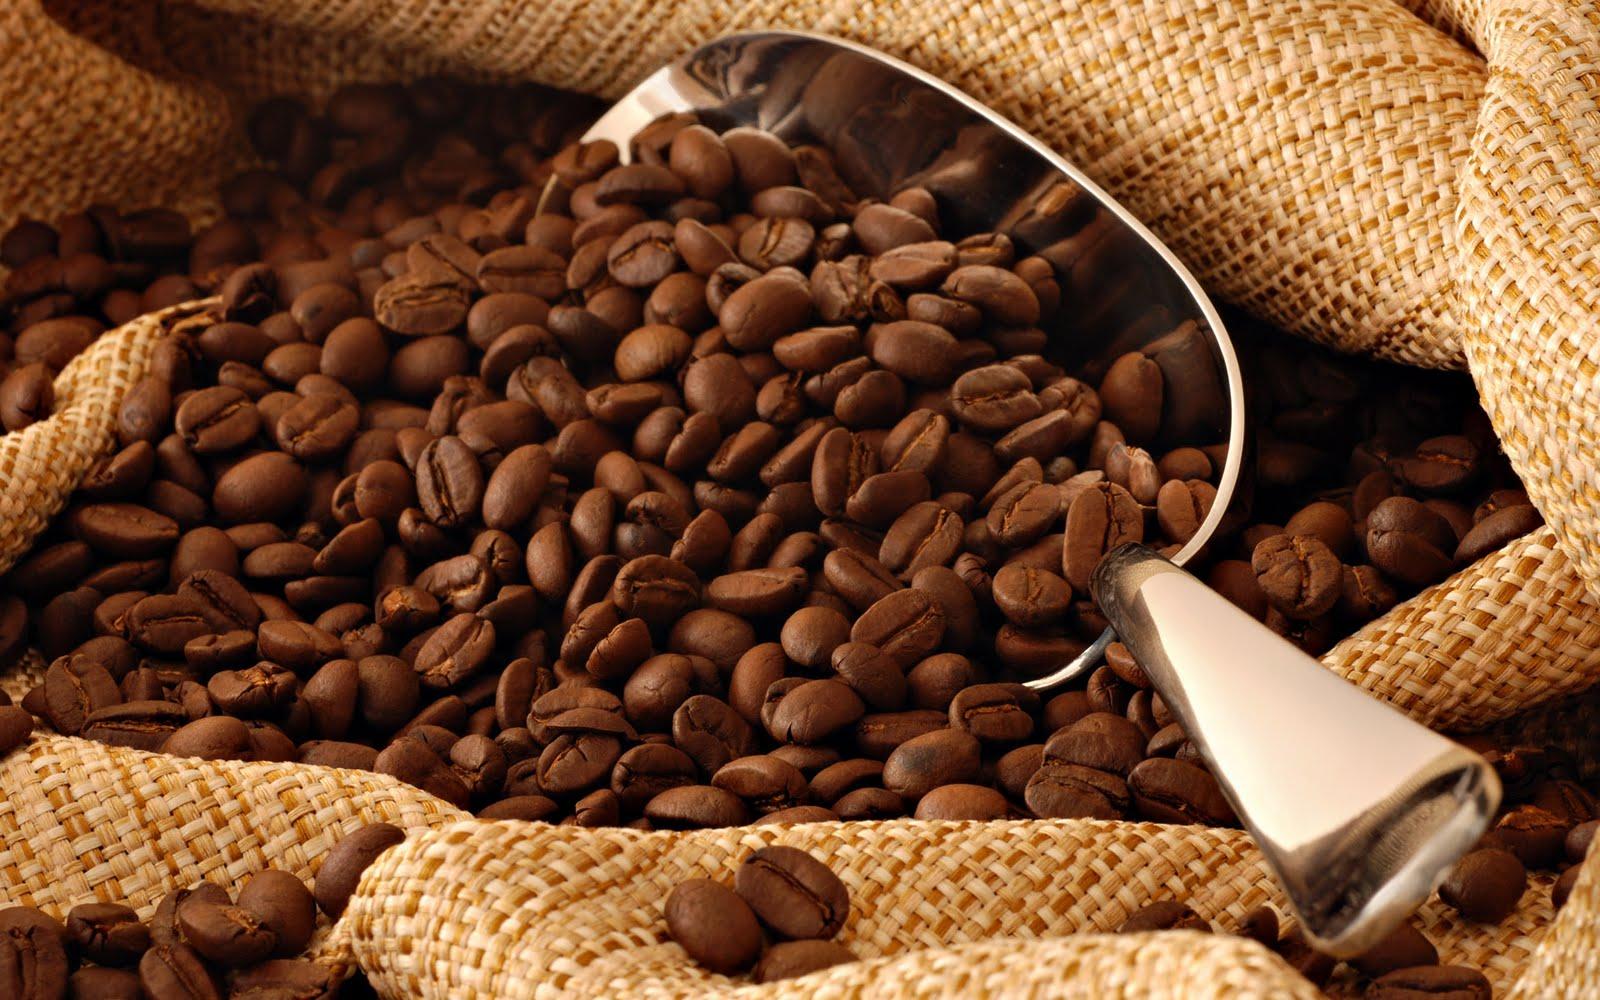 lavement-cafe-plenitude-michele-kech2.jpg